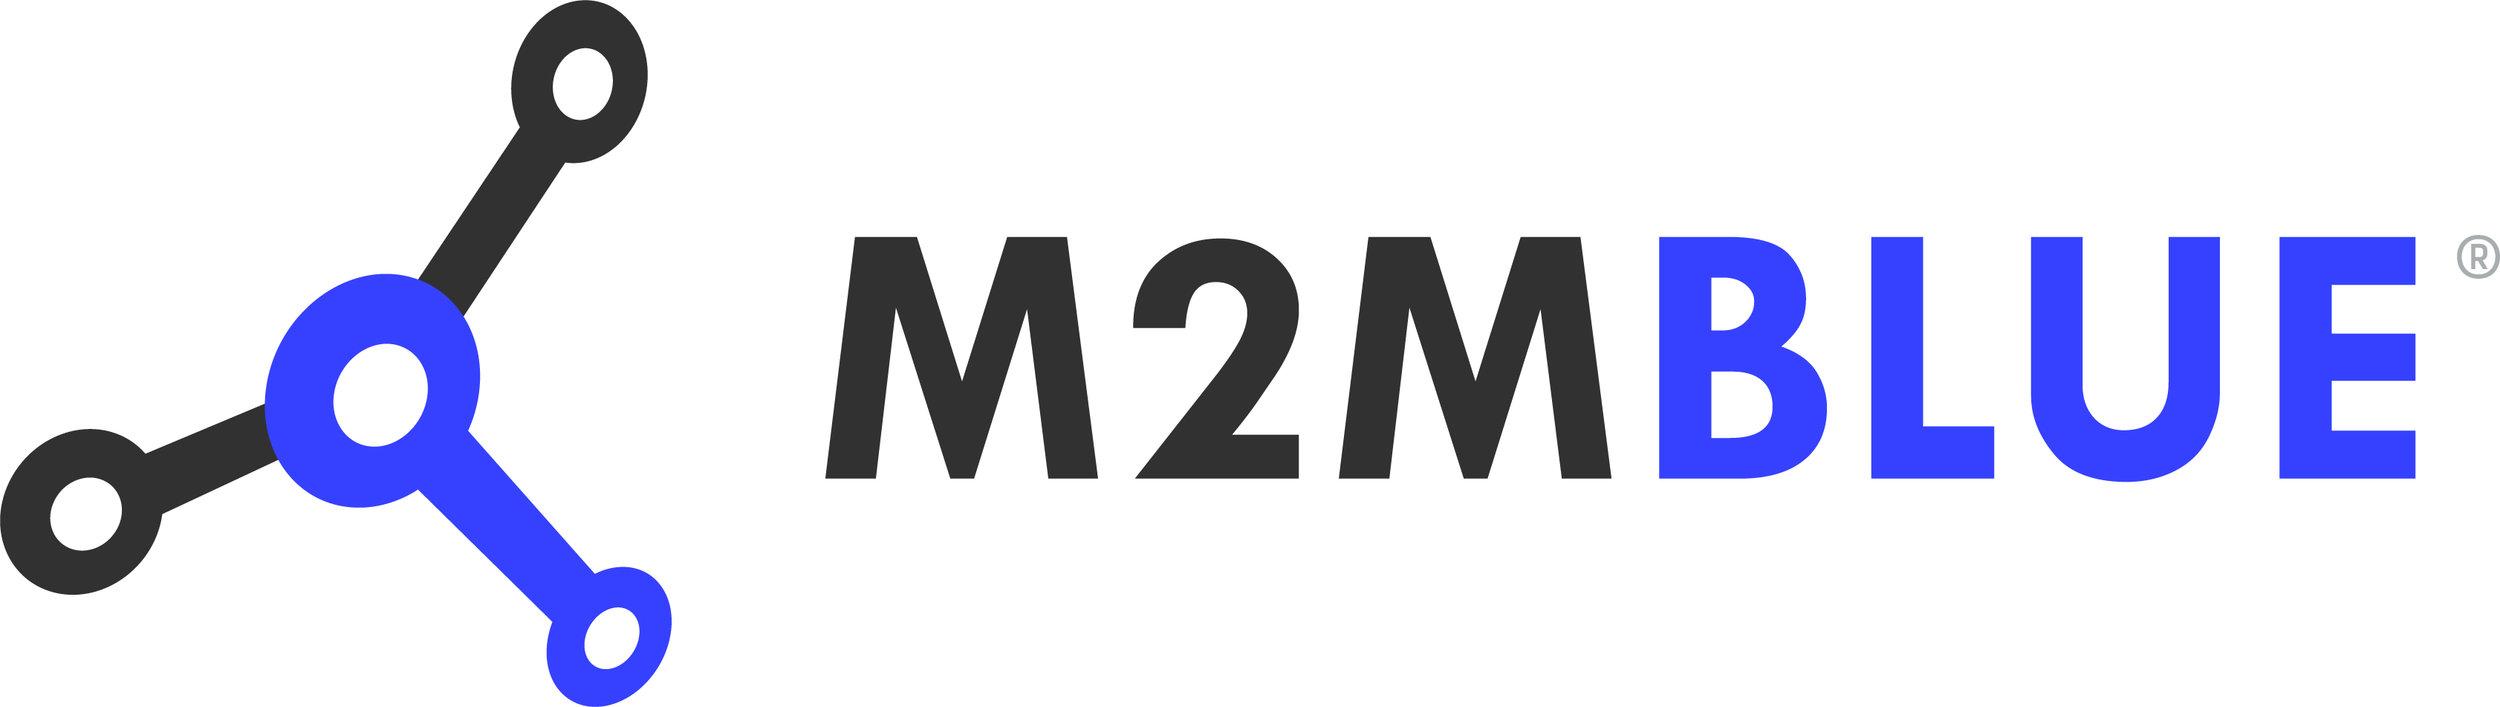 M2M-logo-liggend_RGB.JPG